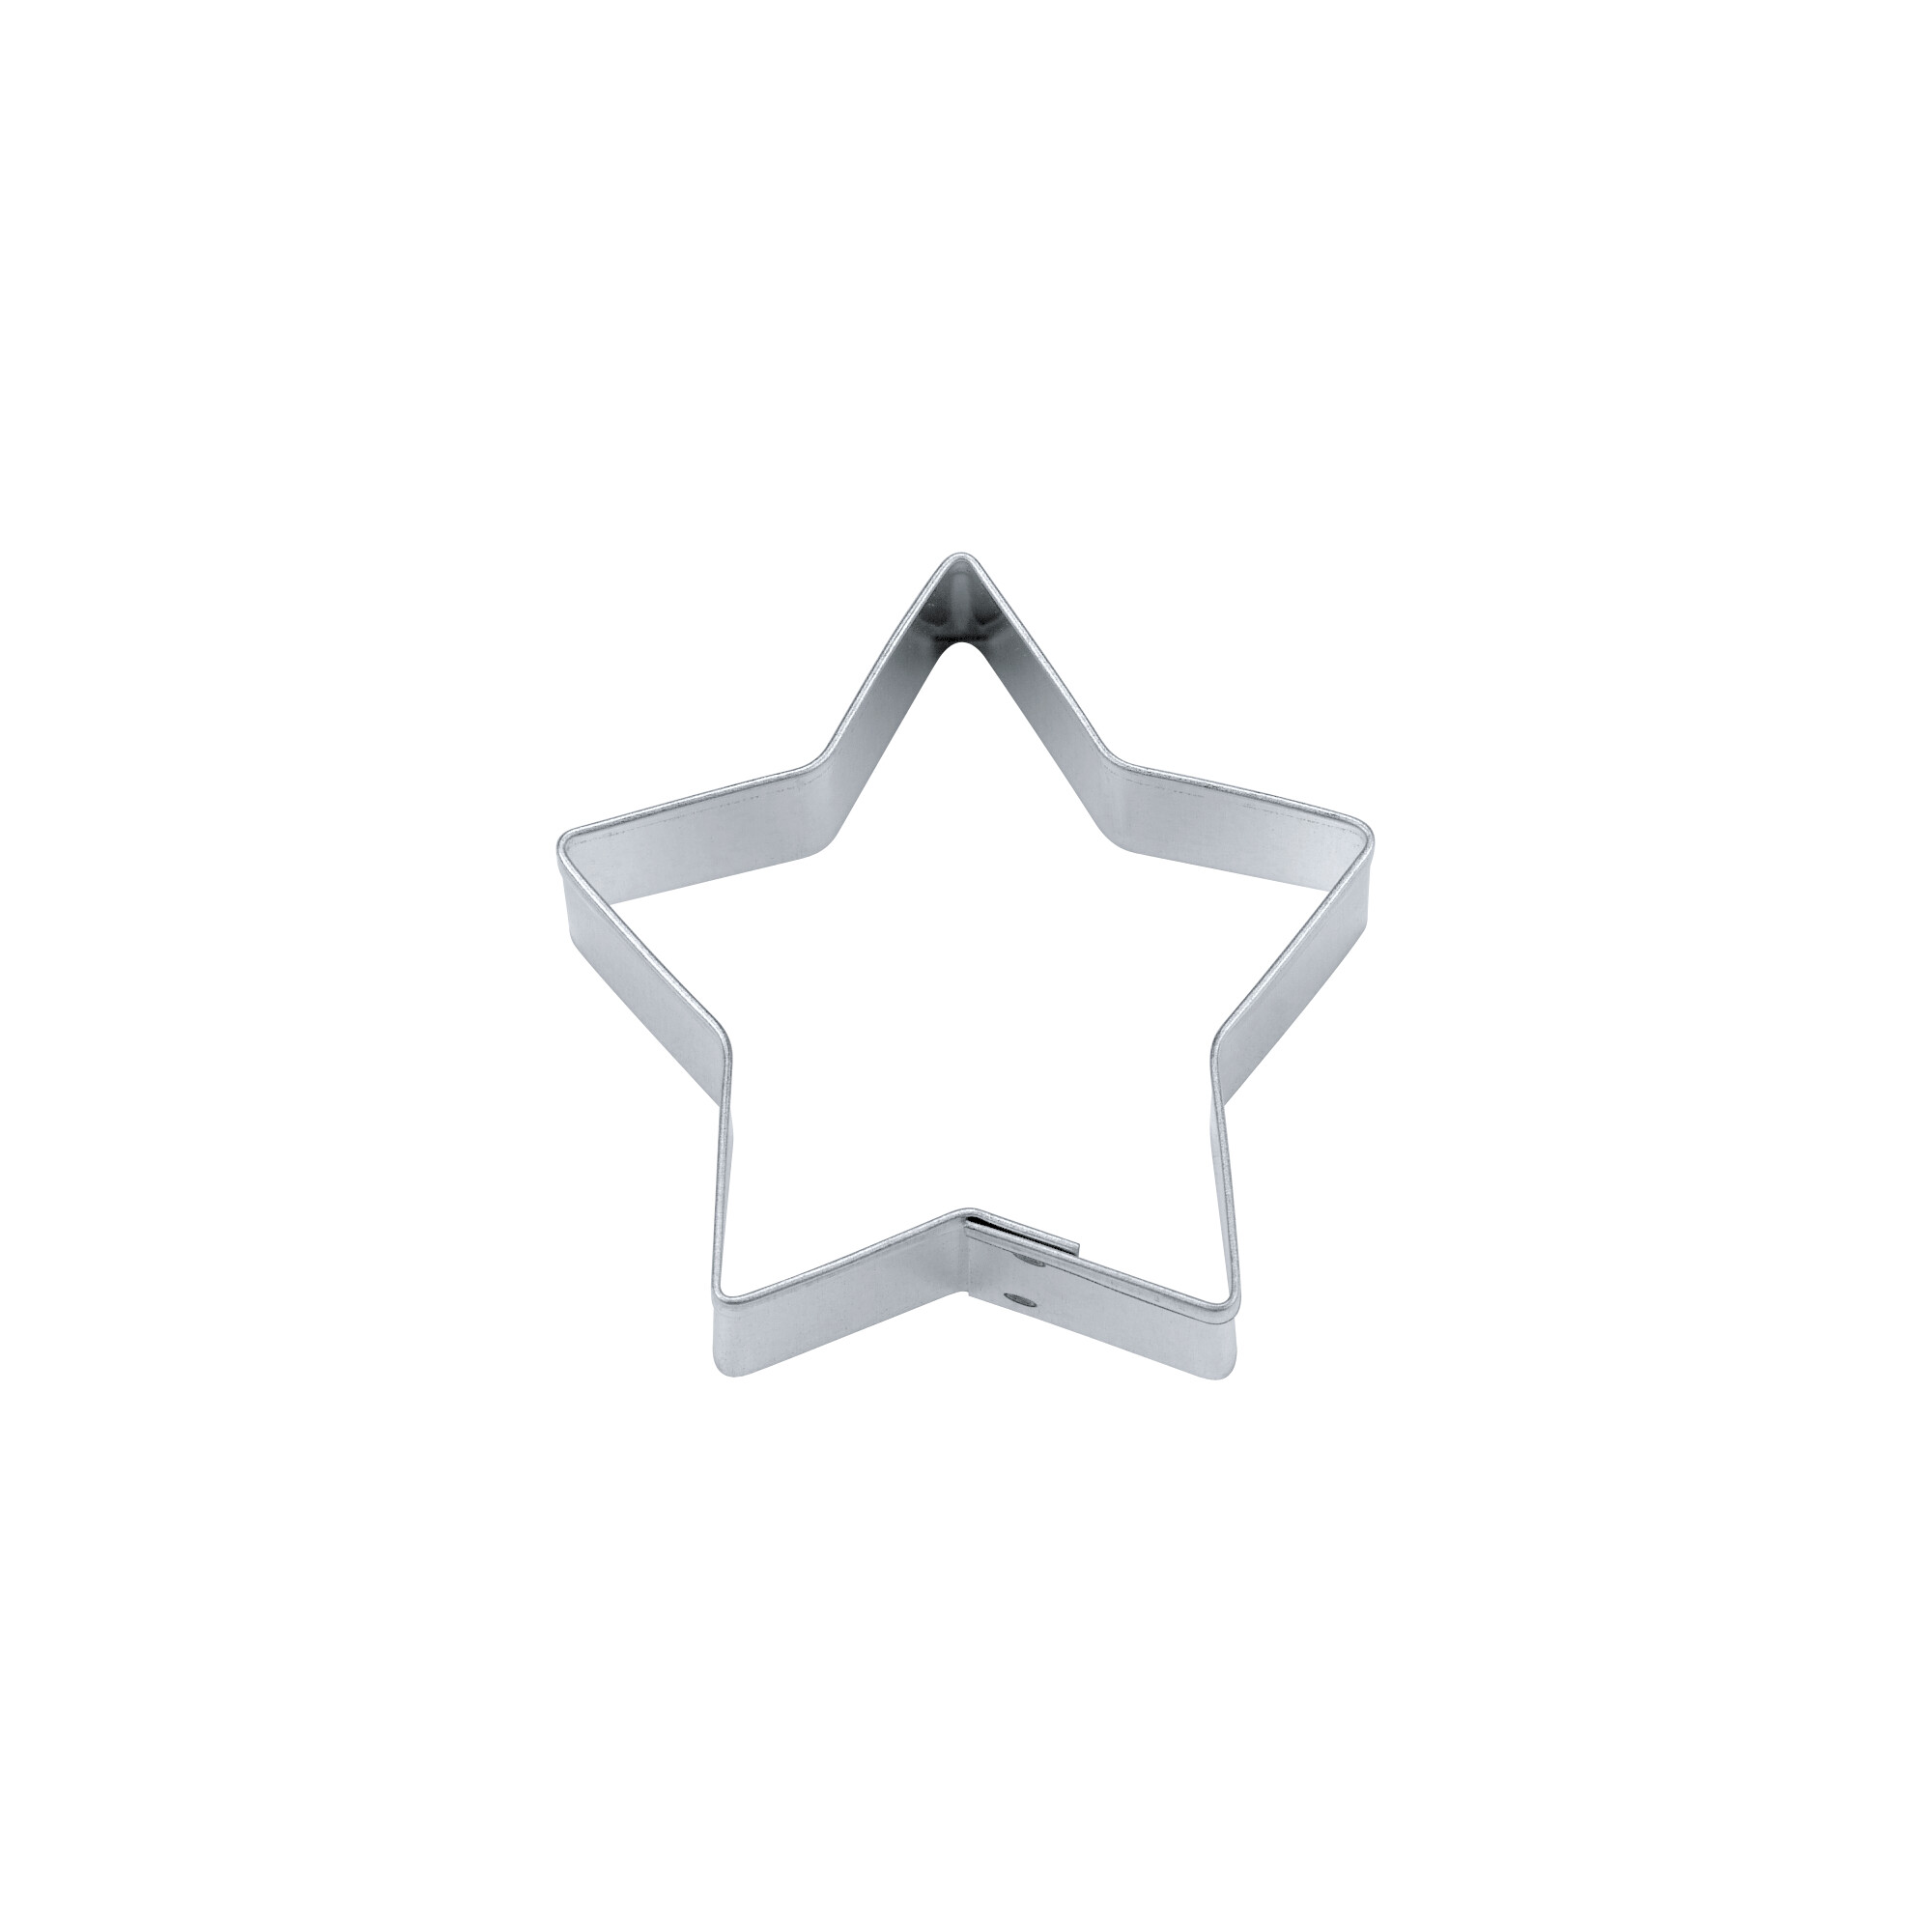 Ausstecher - Stern - 5-zackig